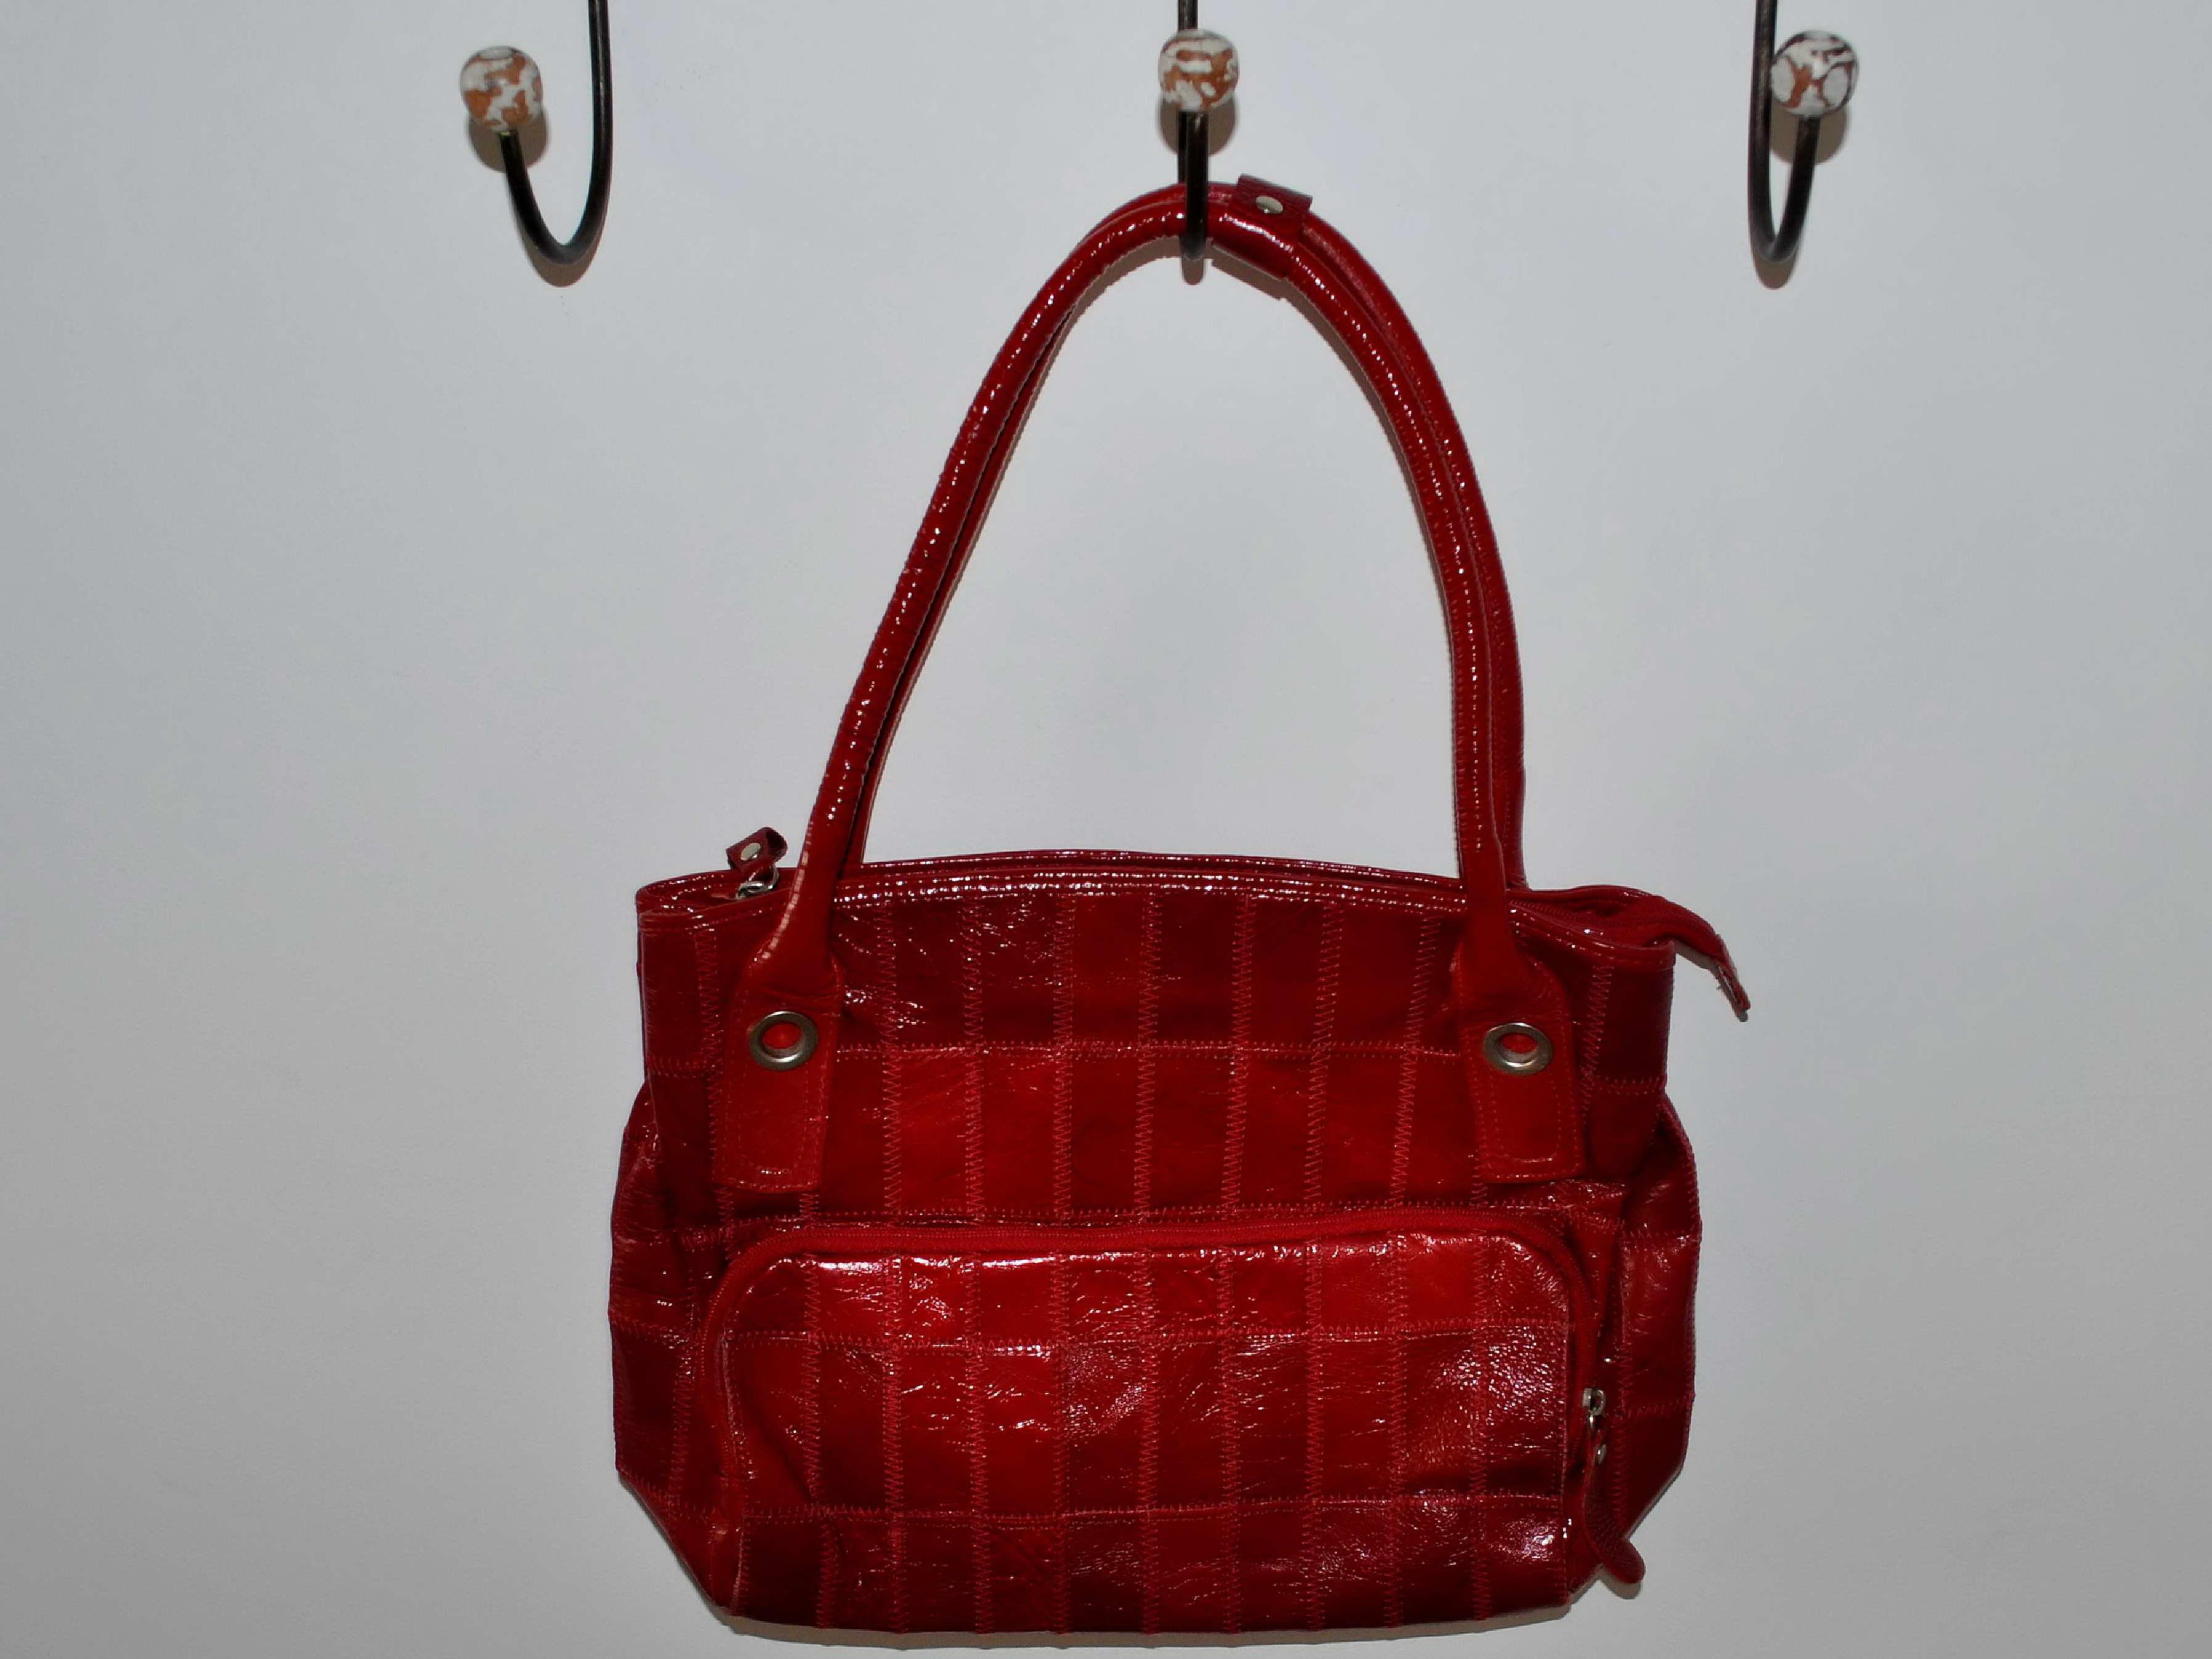 Free photograph; woman, red, handbag, hanging, hanger